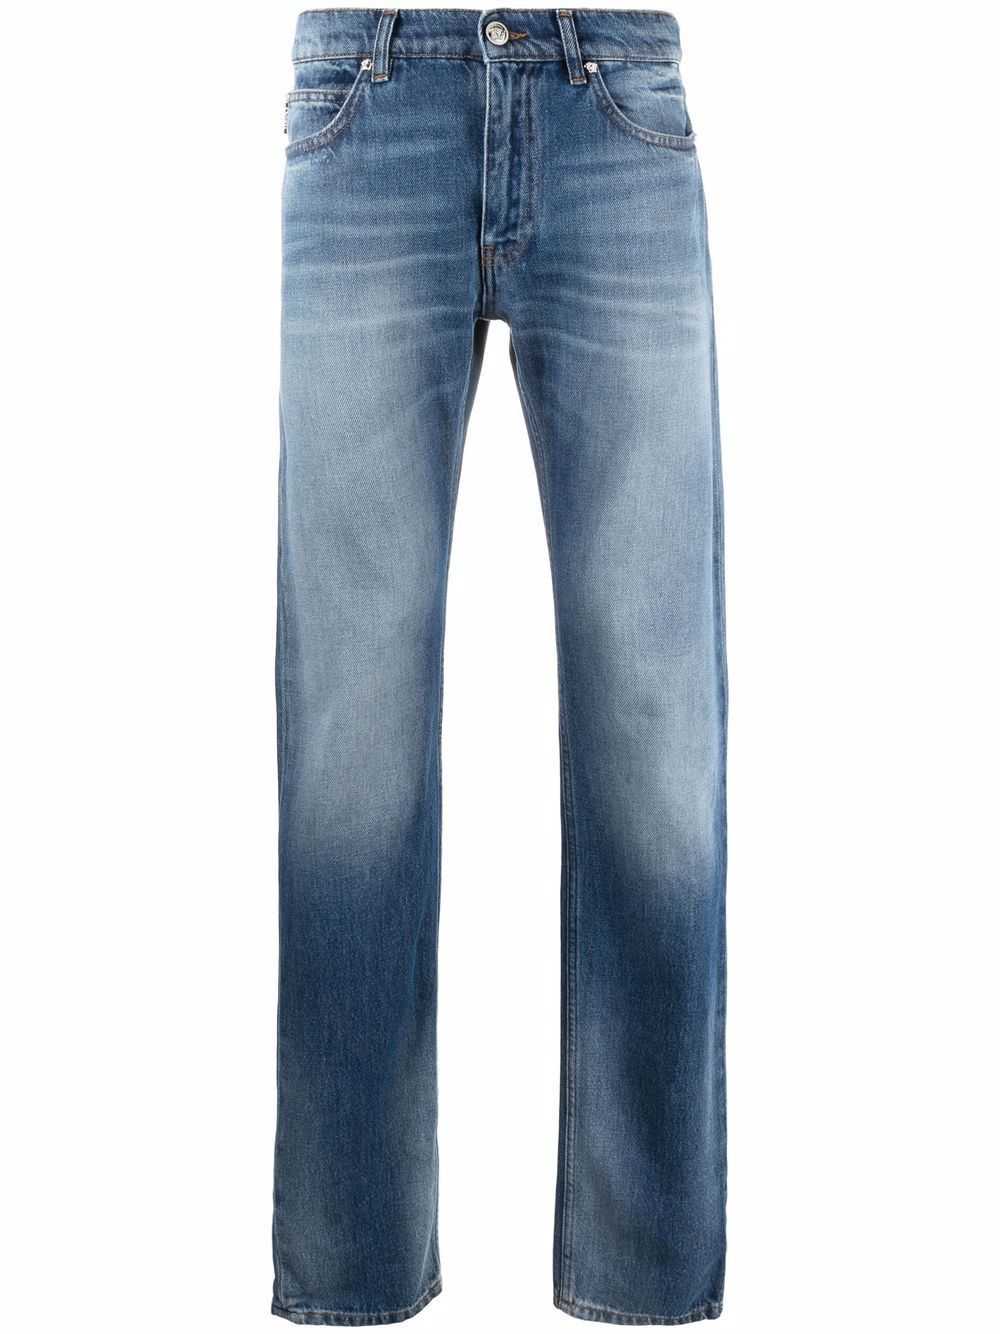 Versace jeans denim